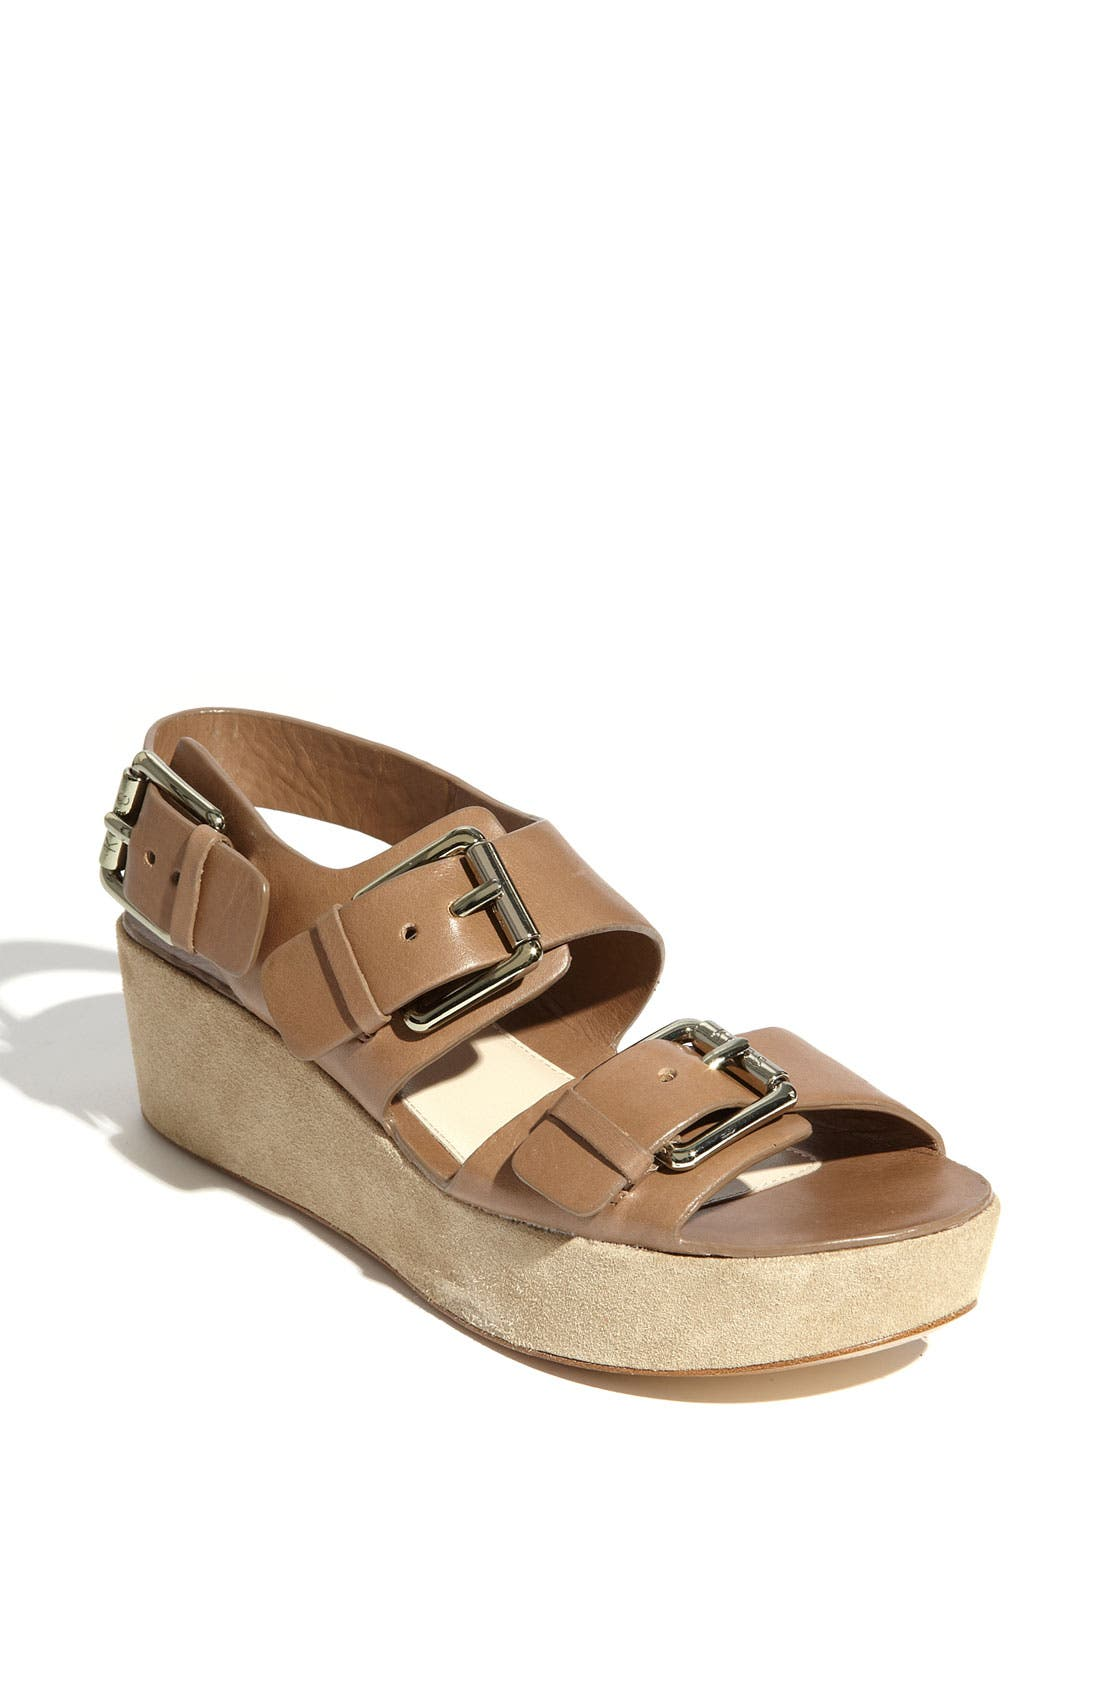 Main Image - KORS Michael Kors 'Zoe' Sandal